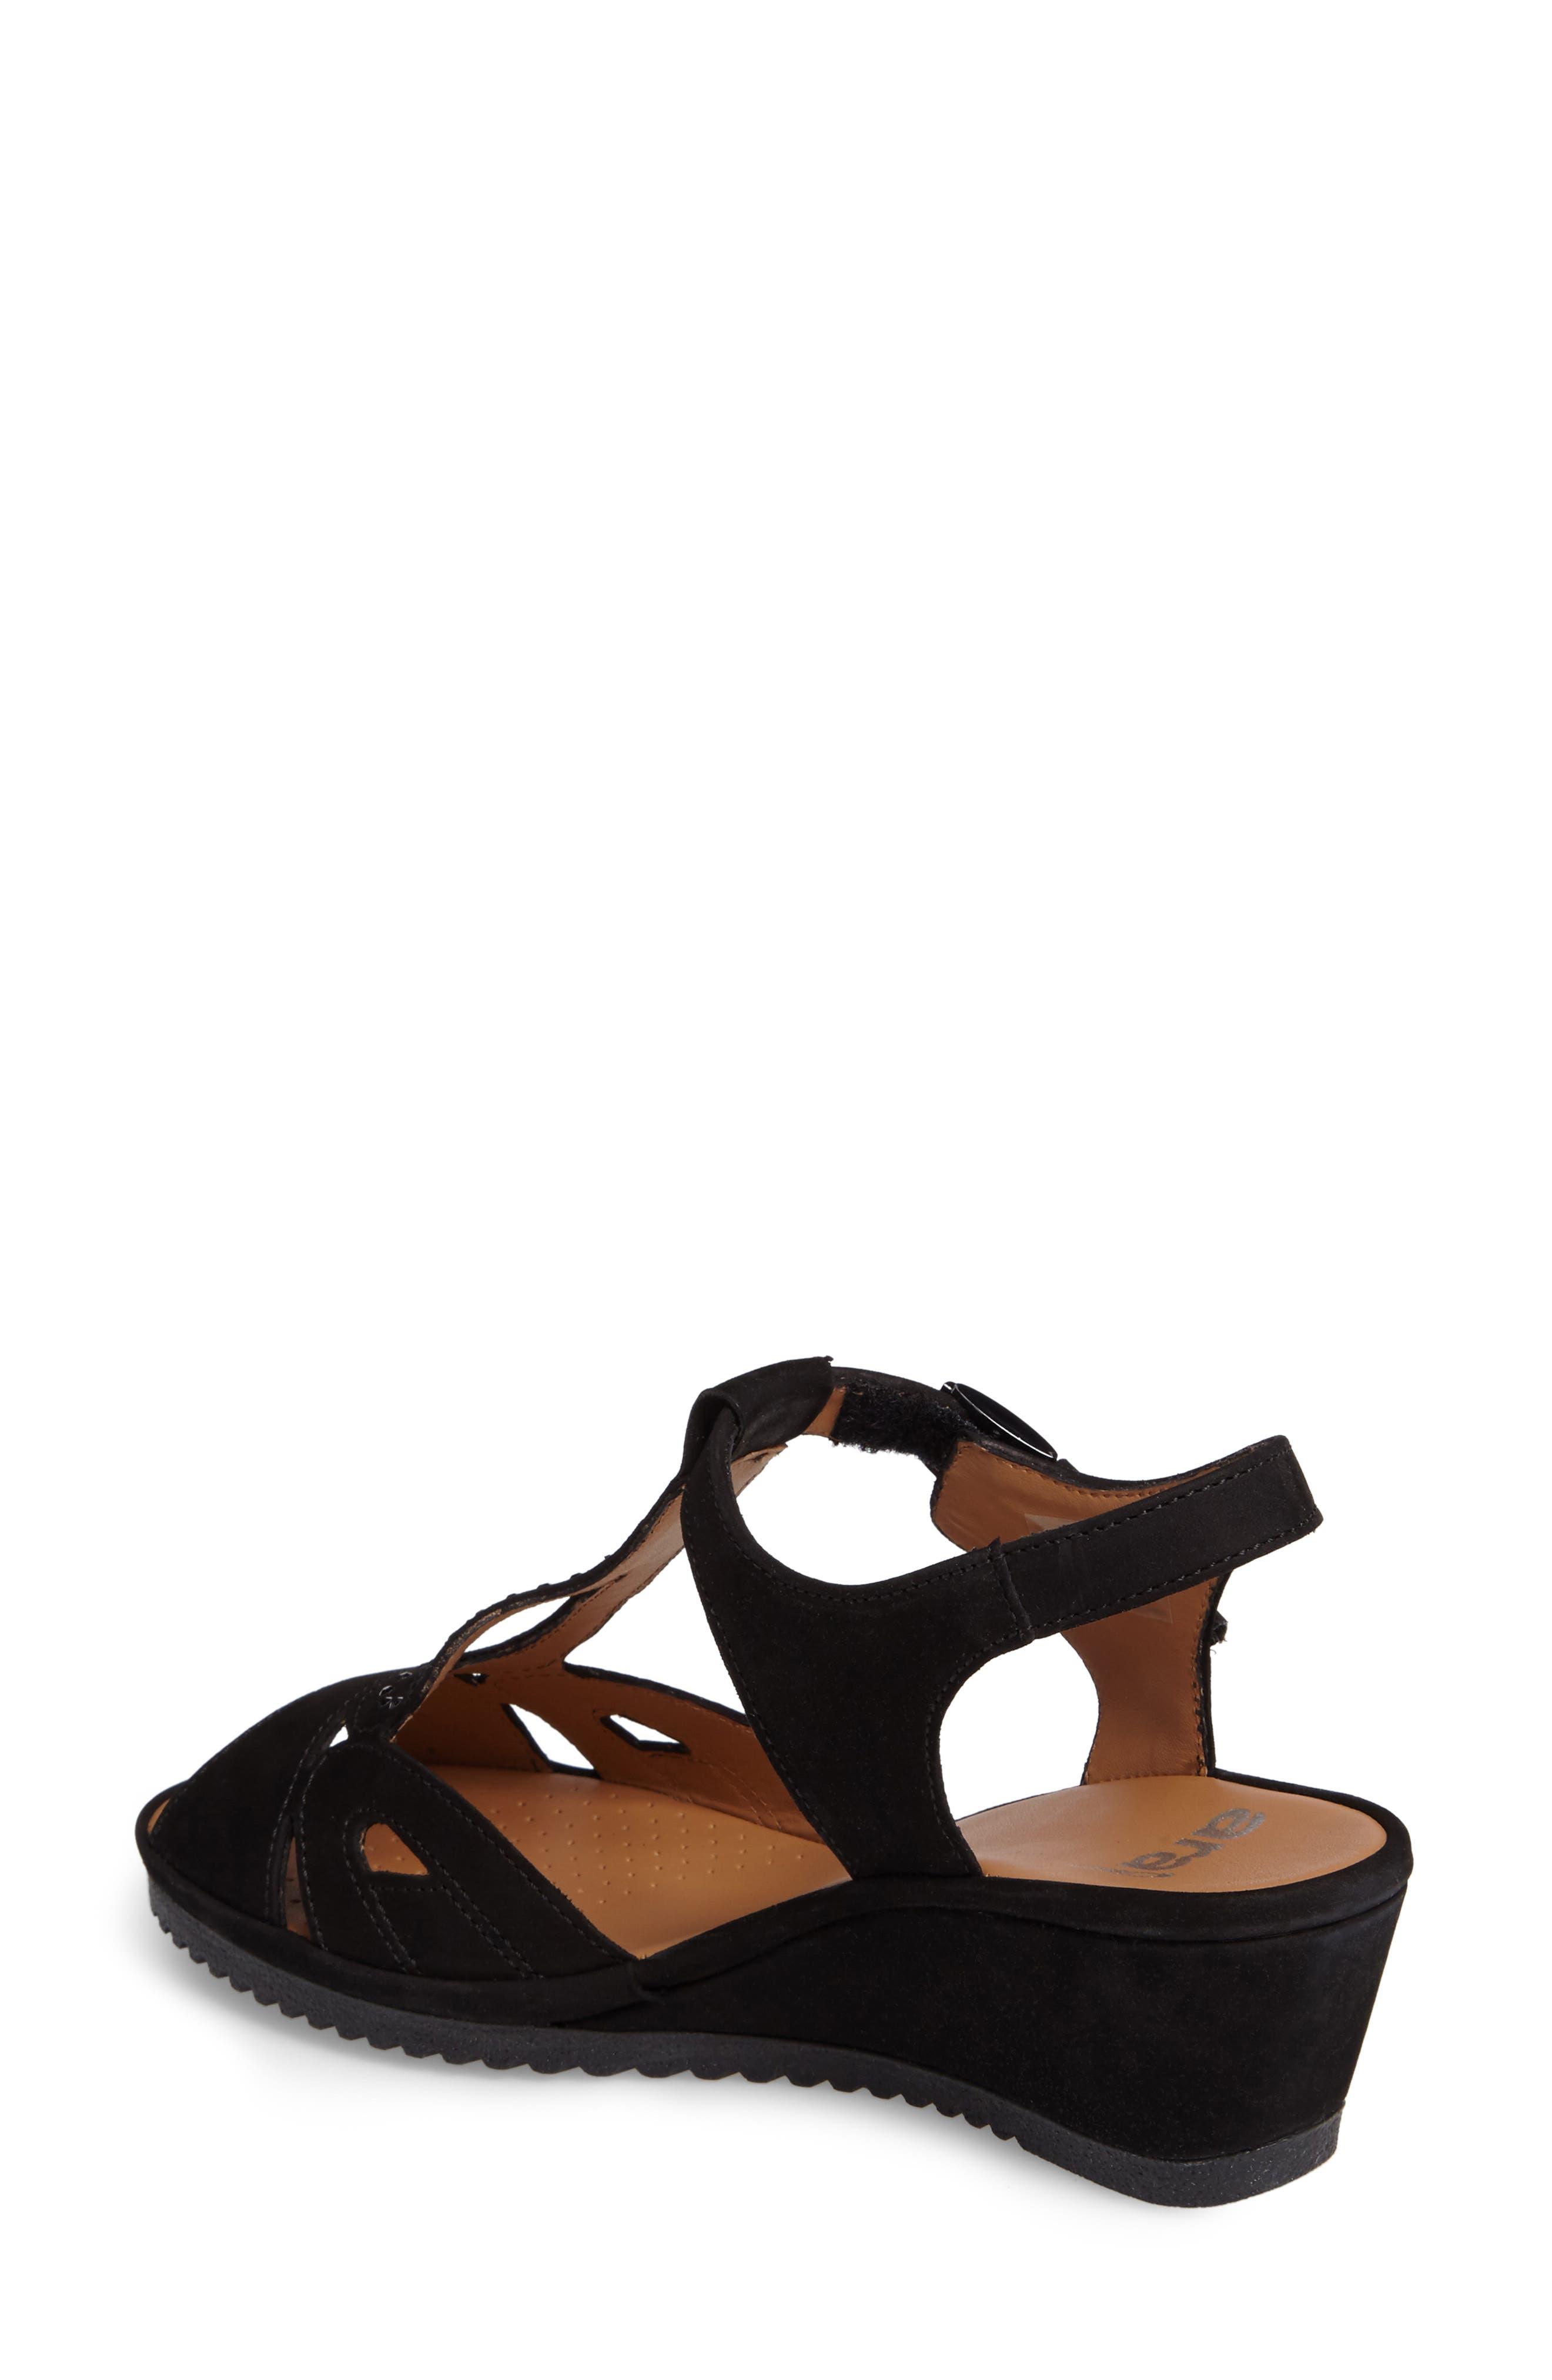 Wedge Sandal,                             Alternate thumbnail 2, color,                             BLACK